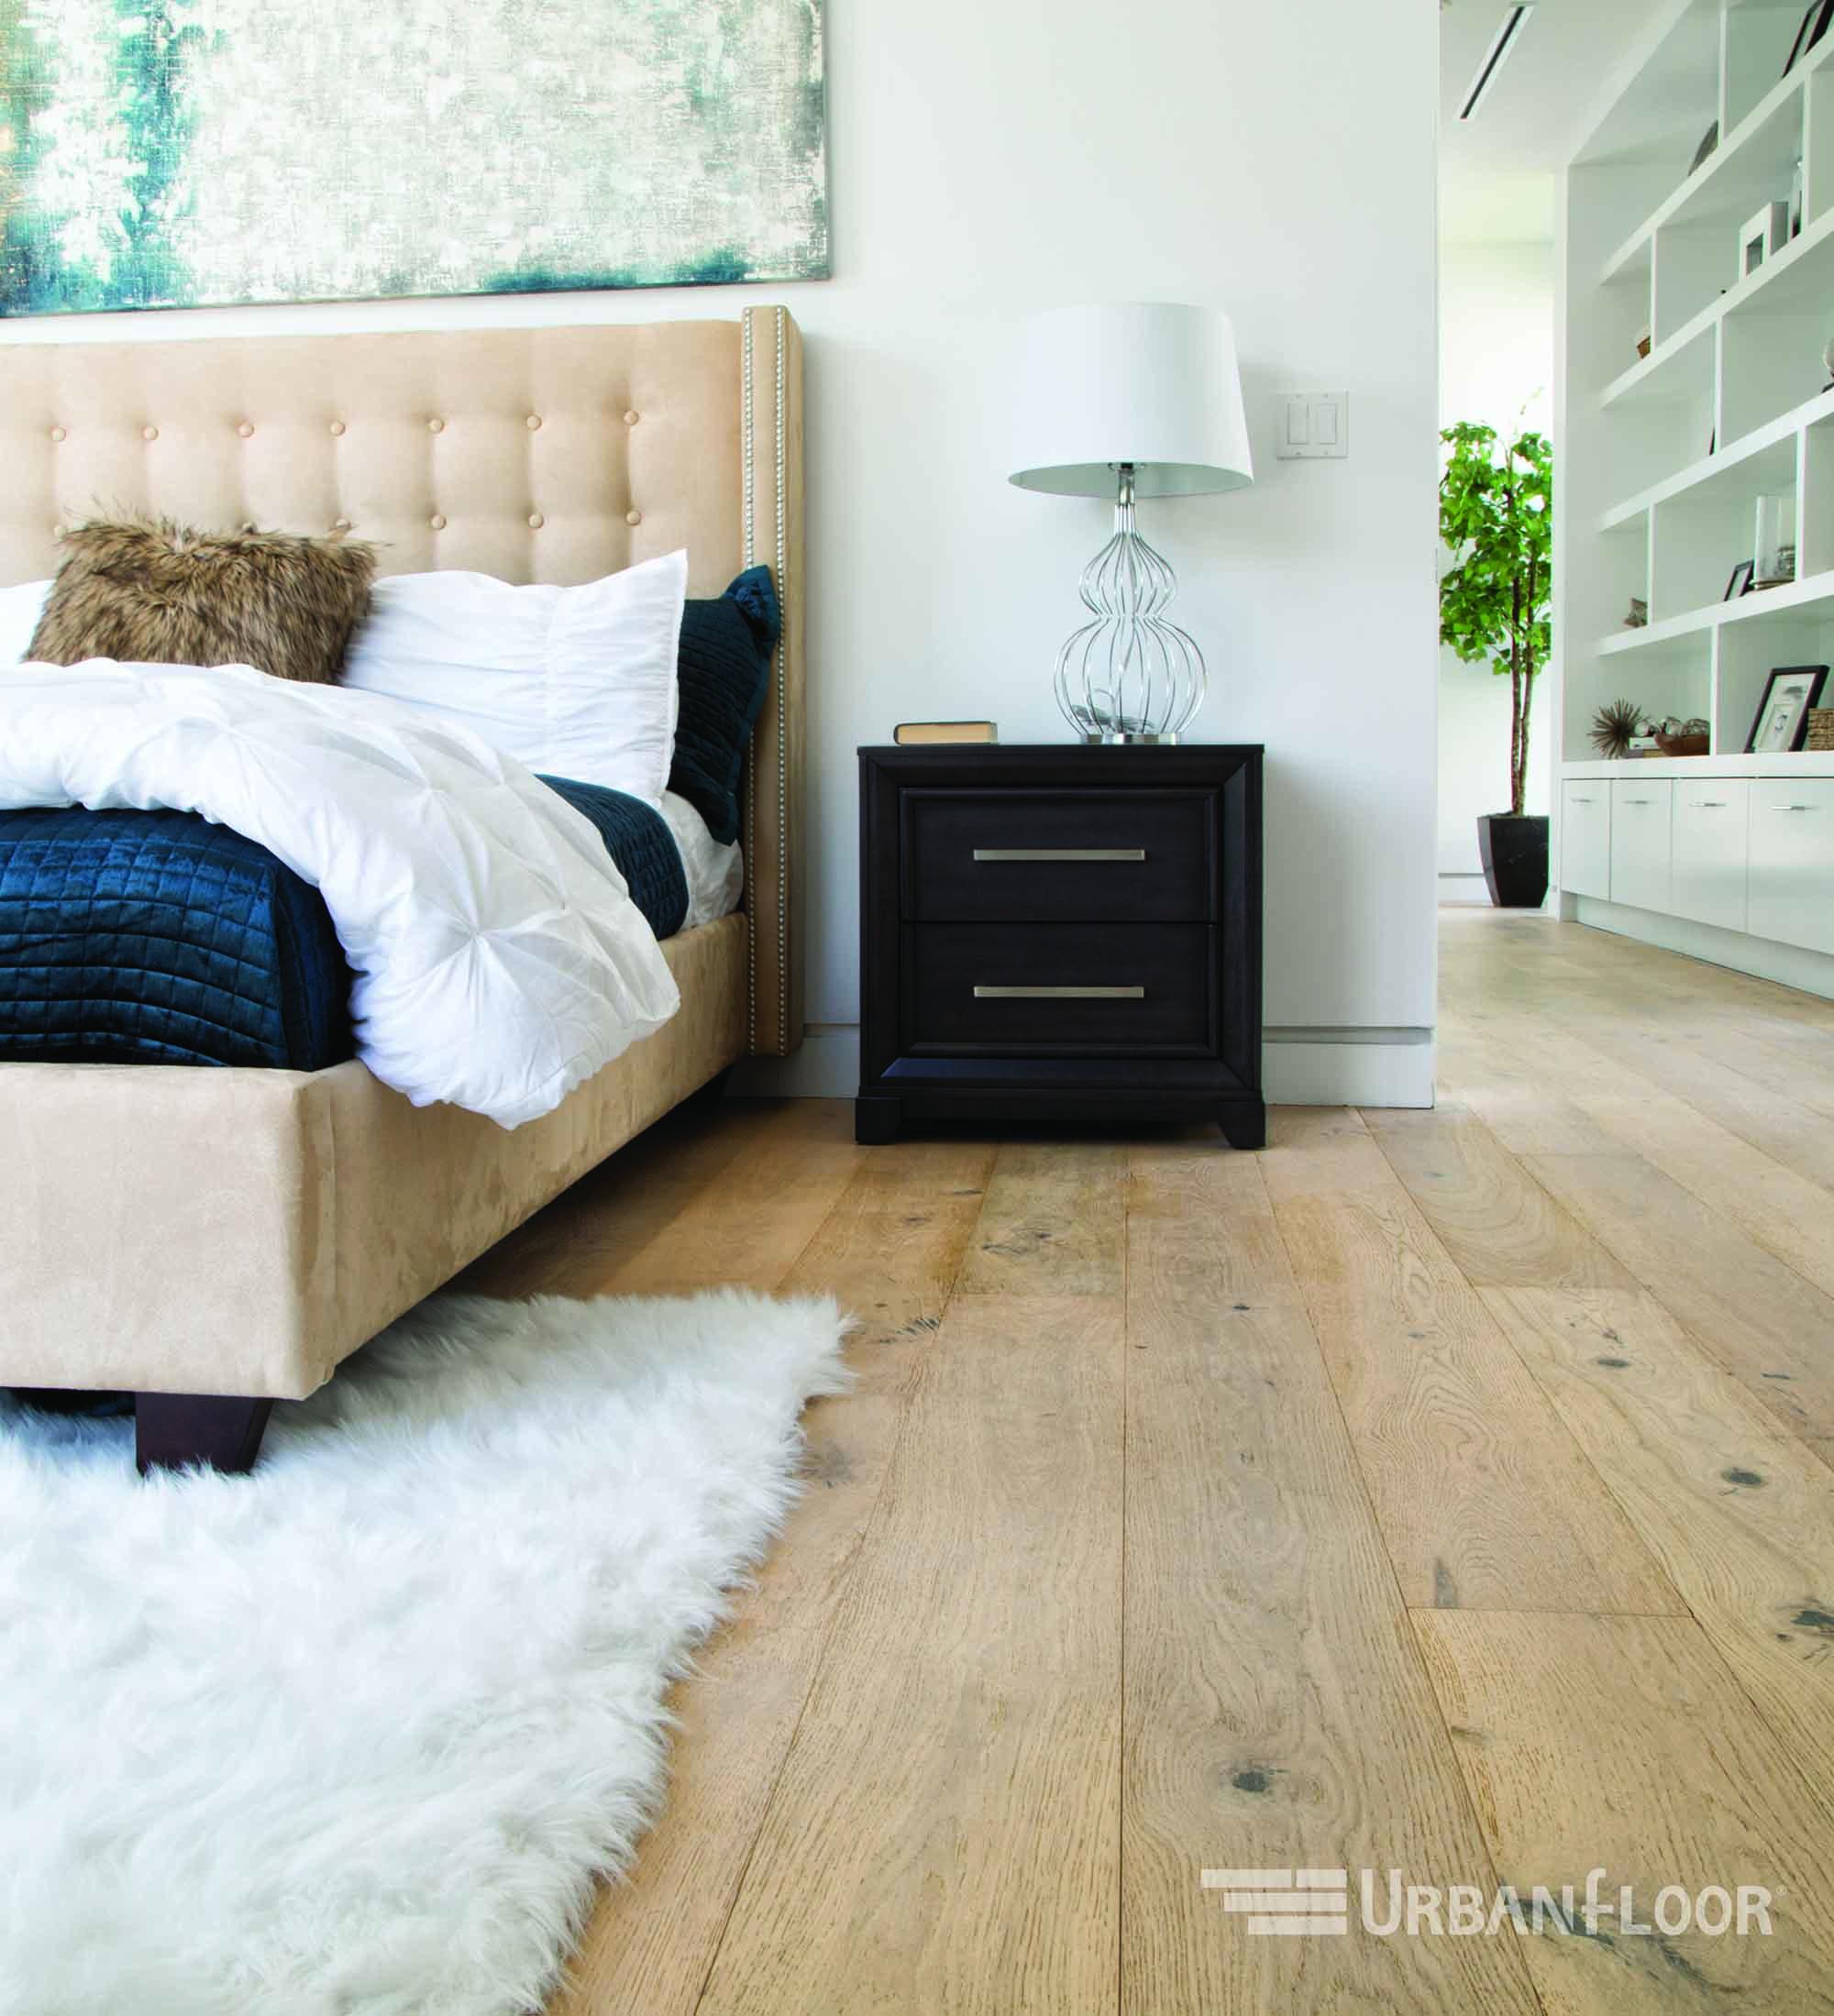 chene lambrusco harwood floor bedroom space.jpg